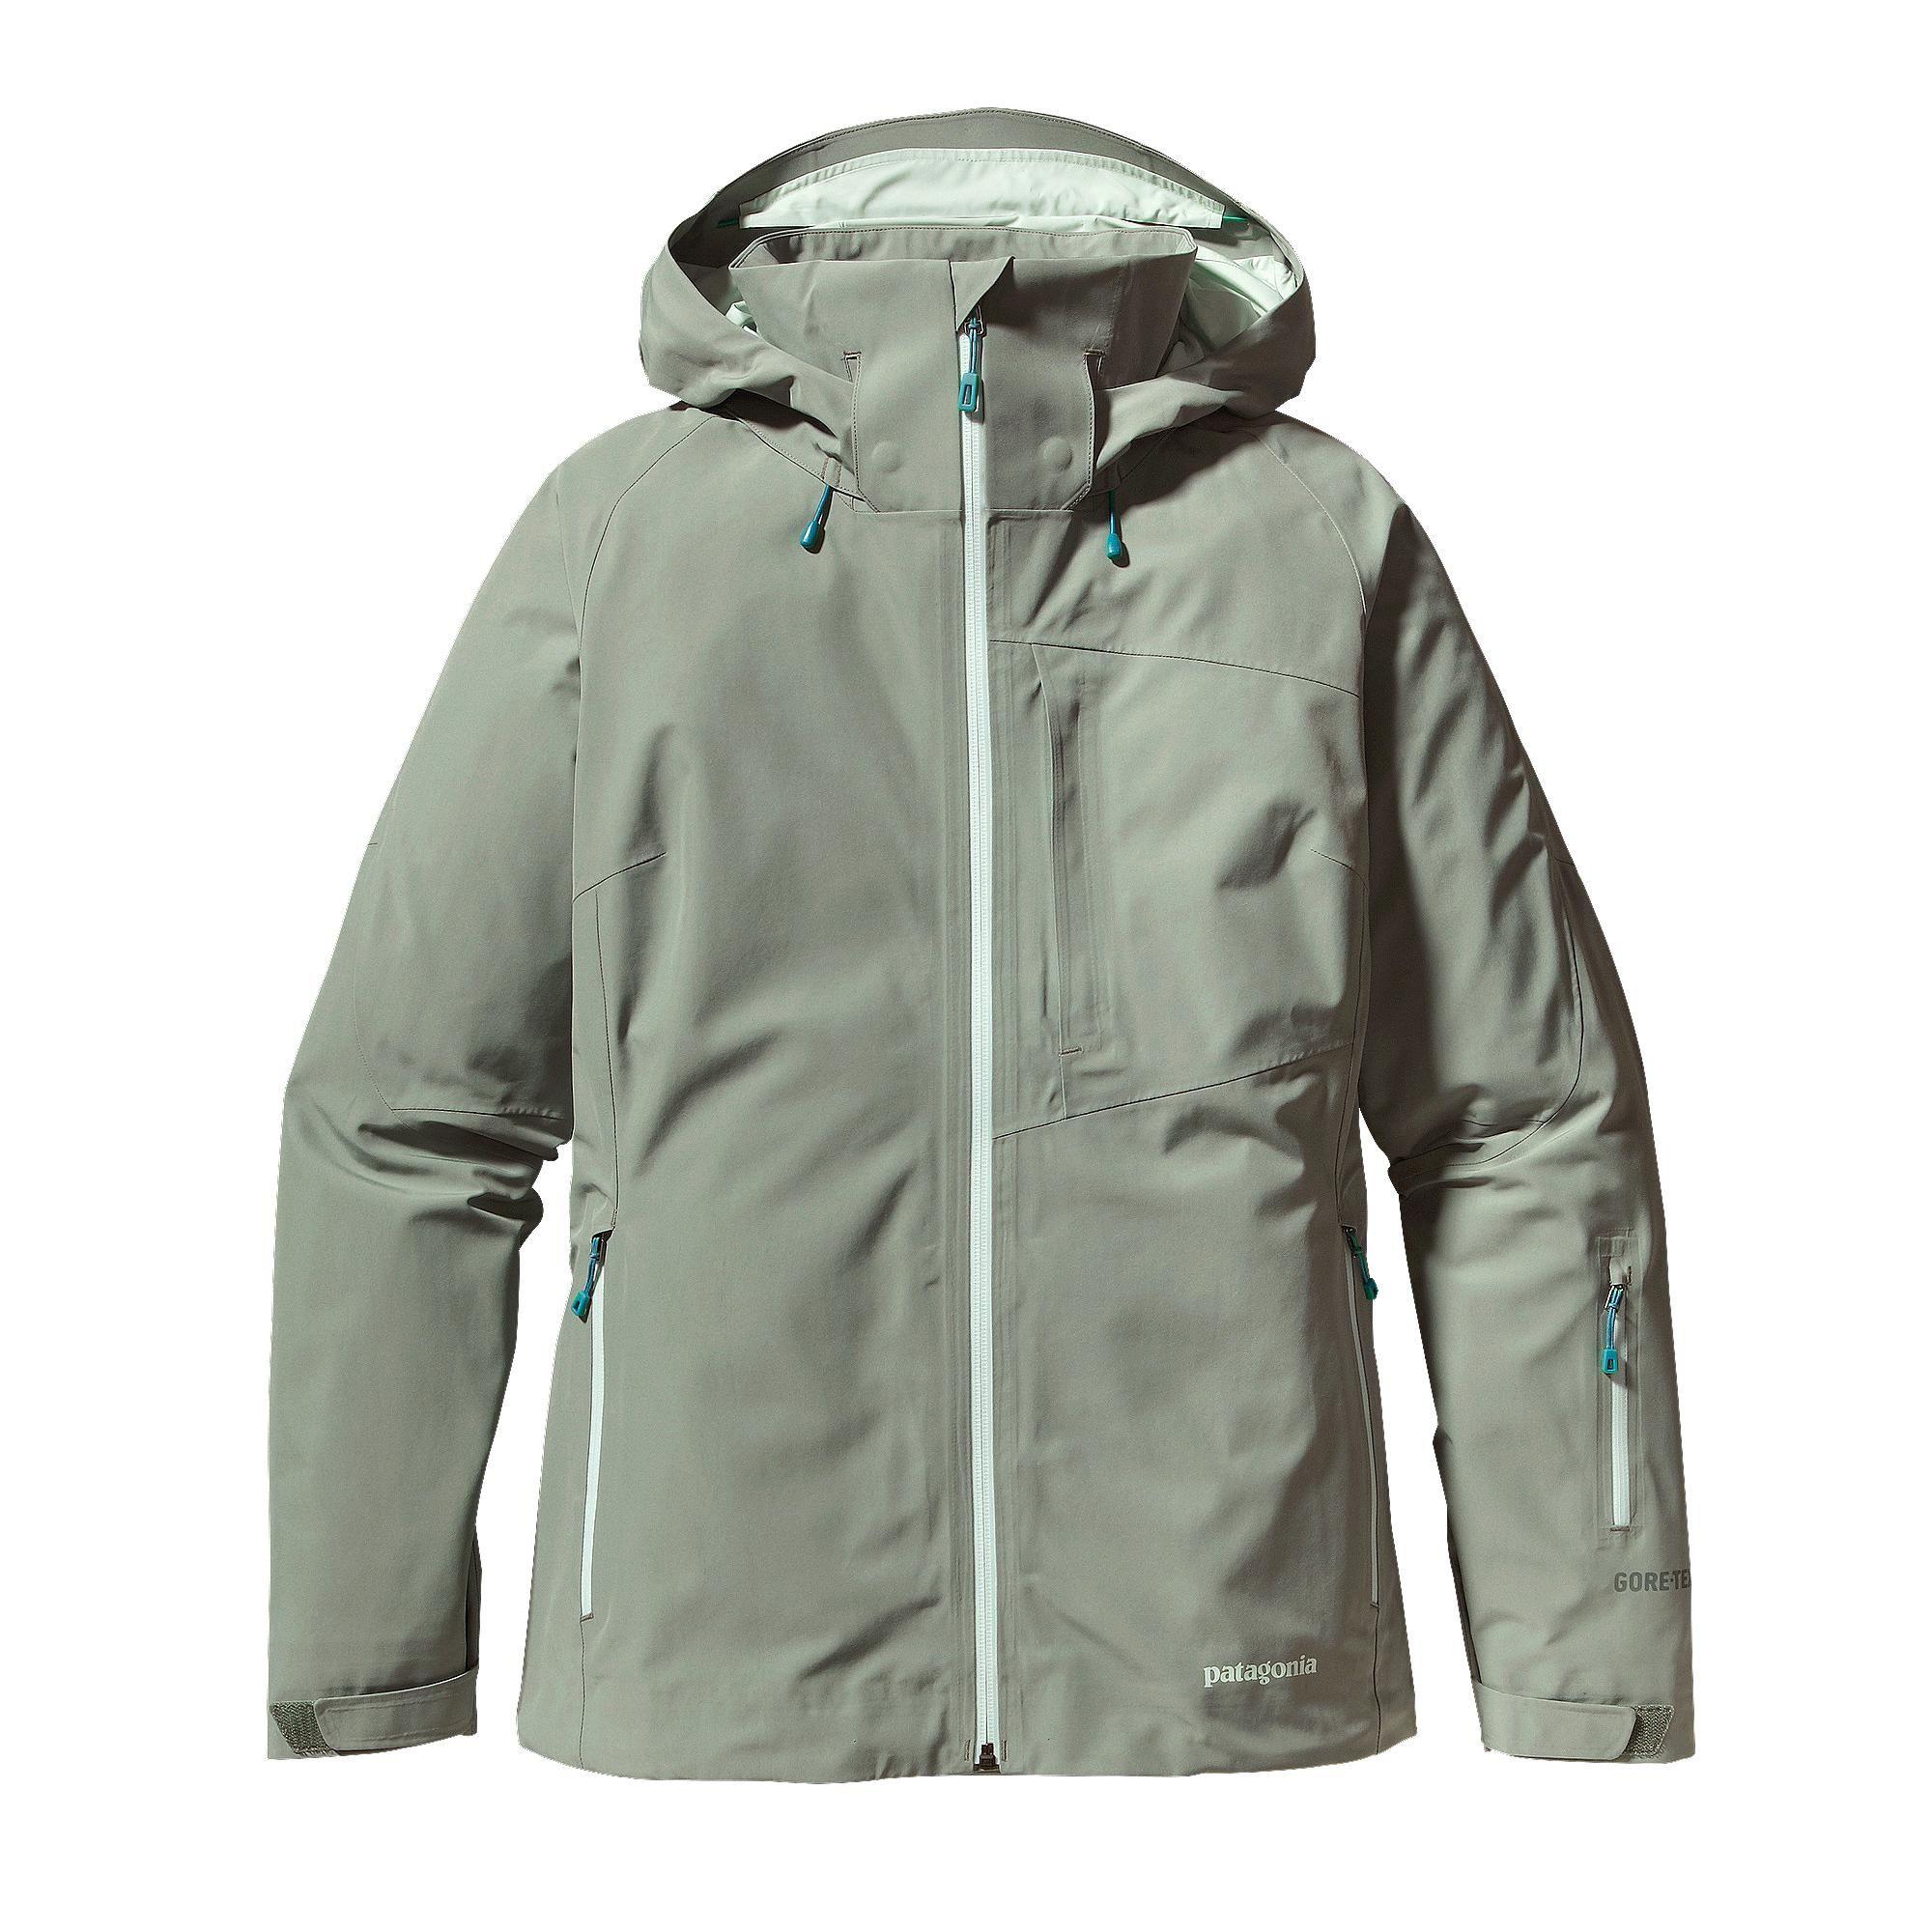 ea0e907935c Orage Suite Jacket - Women's | Ski | Jackets for women, Jackets, Women